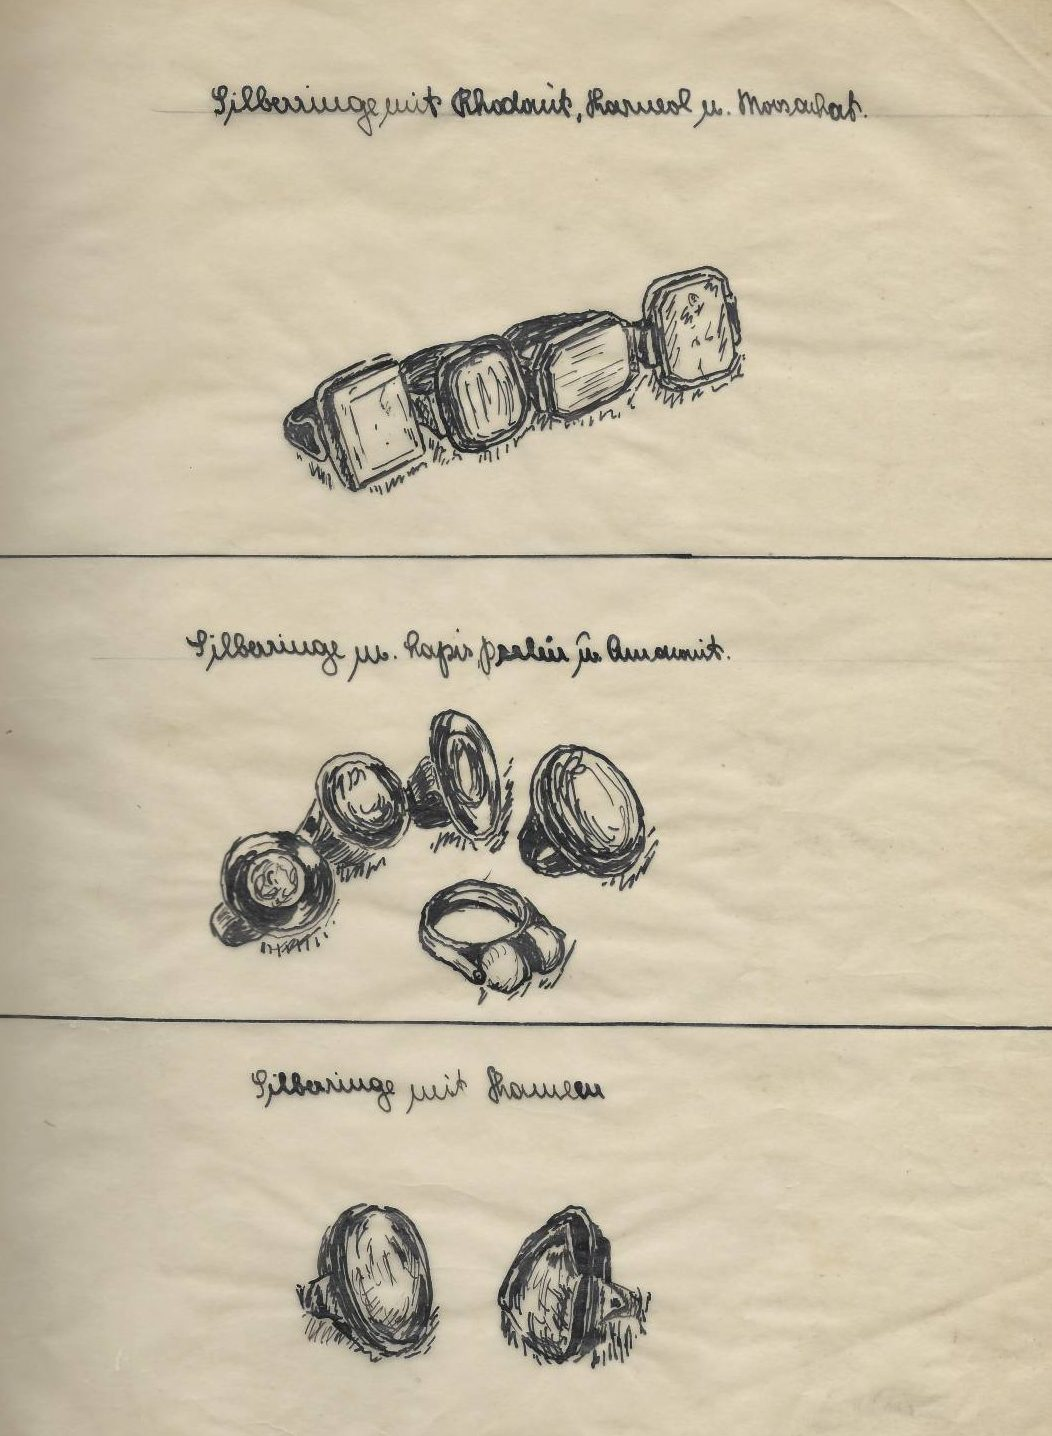 Alfred Dörner, tekening, 1934-1960. Foto met dank aan Grafische Sammlung Stern©